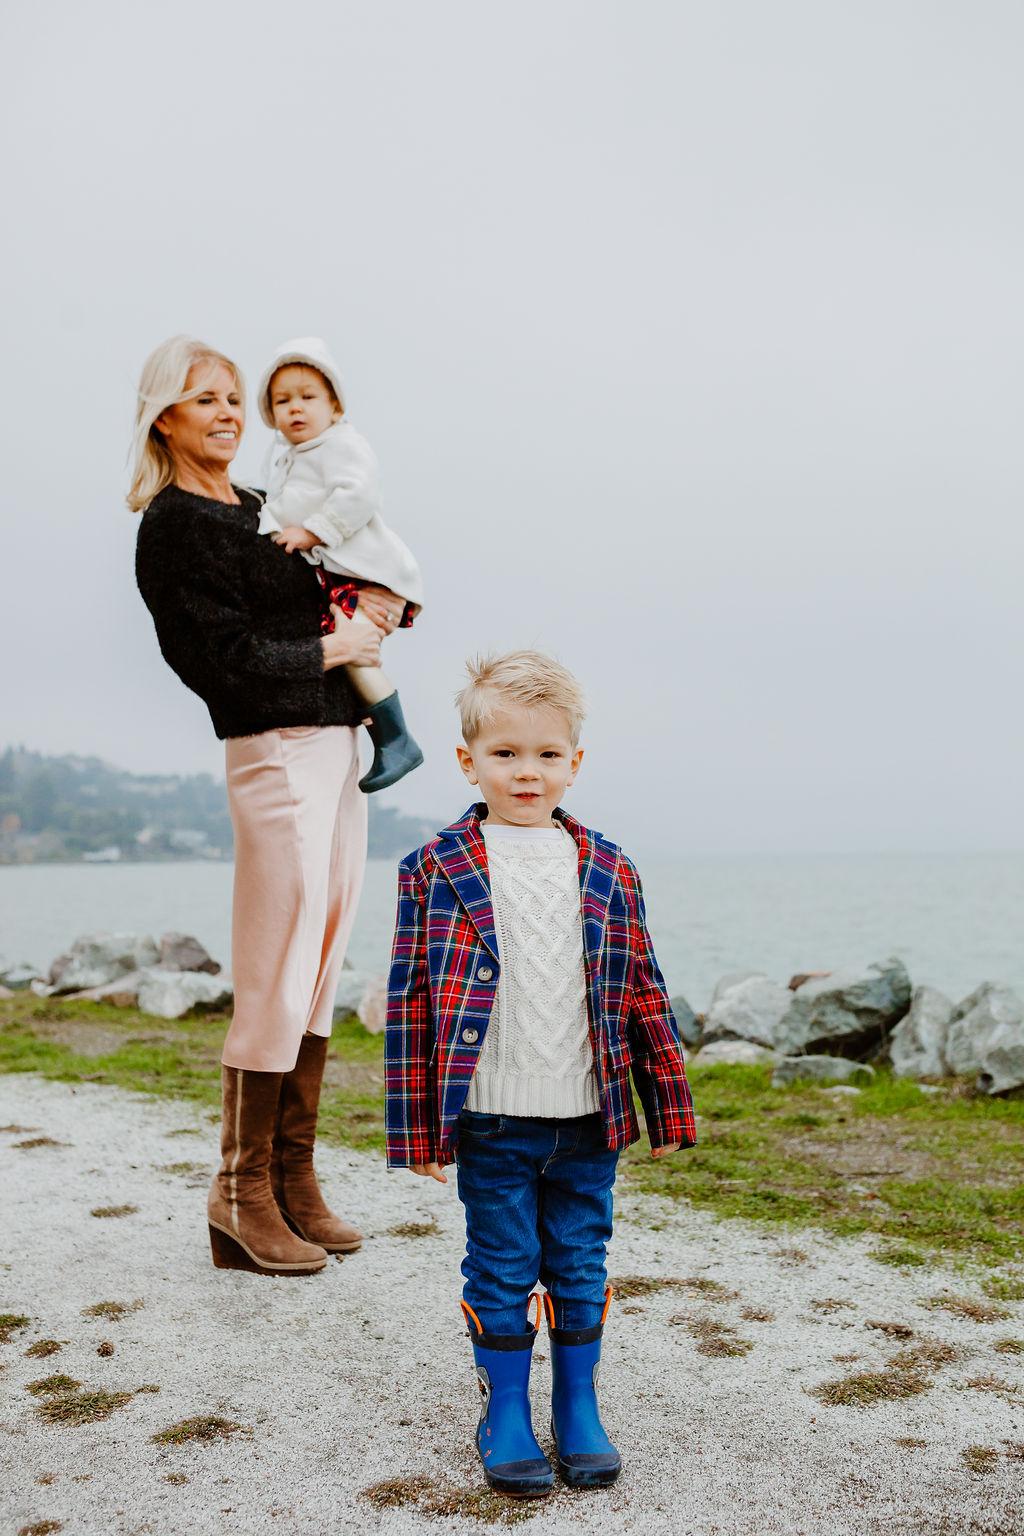 holiday card christmas festive family time quality time San Francisco Tiburon holiday shoot family photoshoot